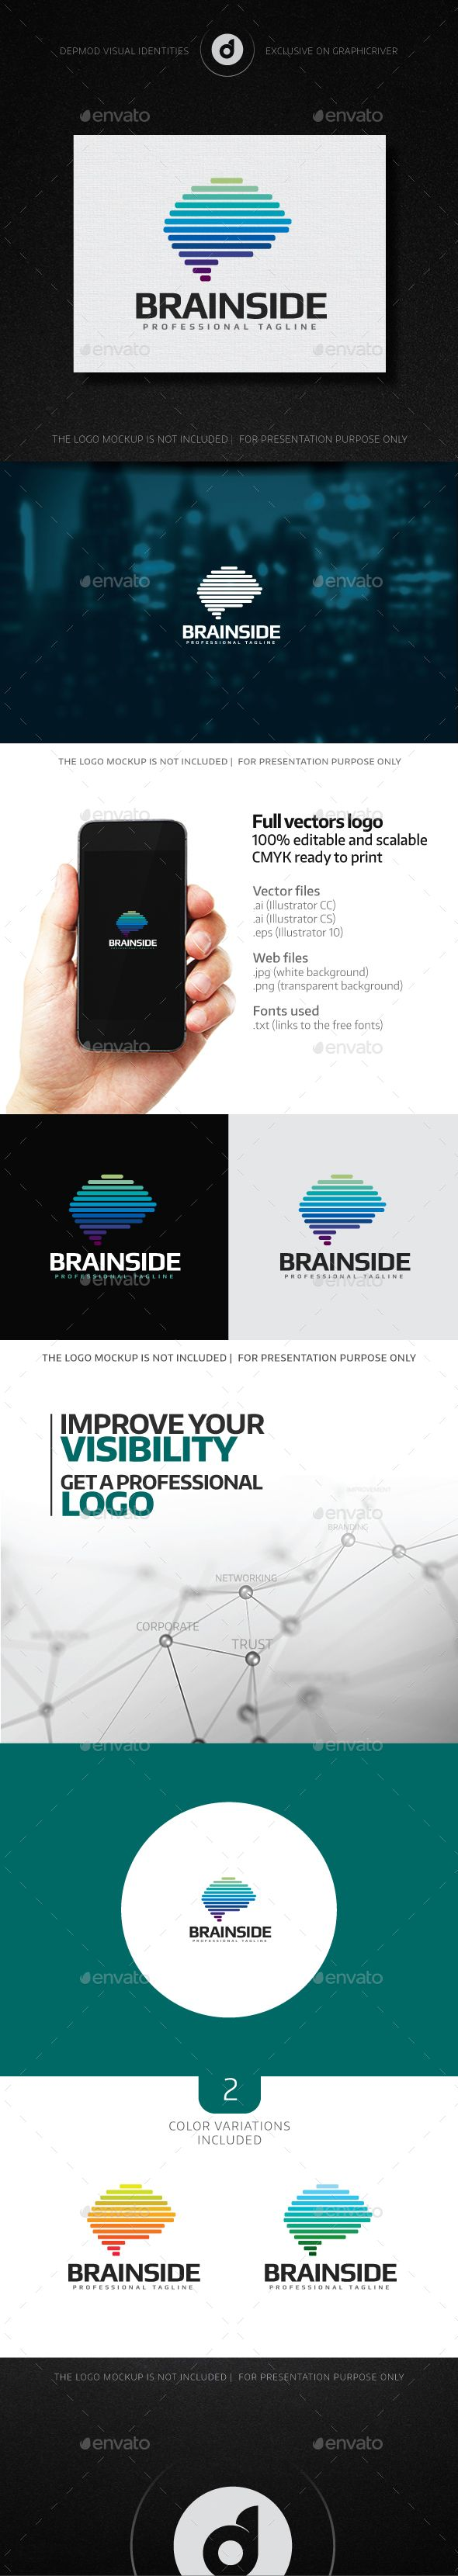 Brain Side Logo Template Vector EPS, AI. Download here: http://graphicriver.net/item/brain-side-logo/13903516?ref=ksioks